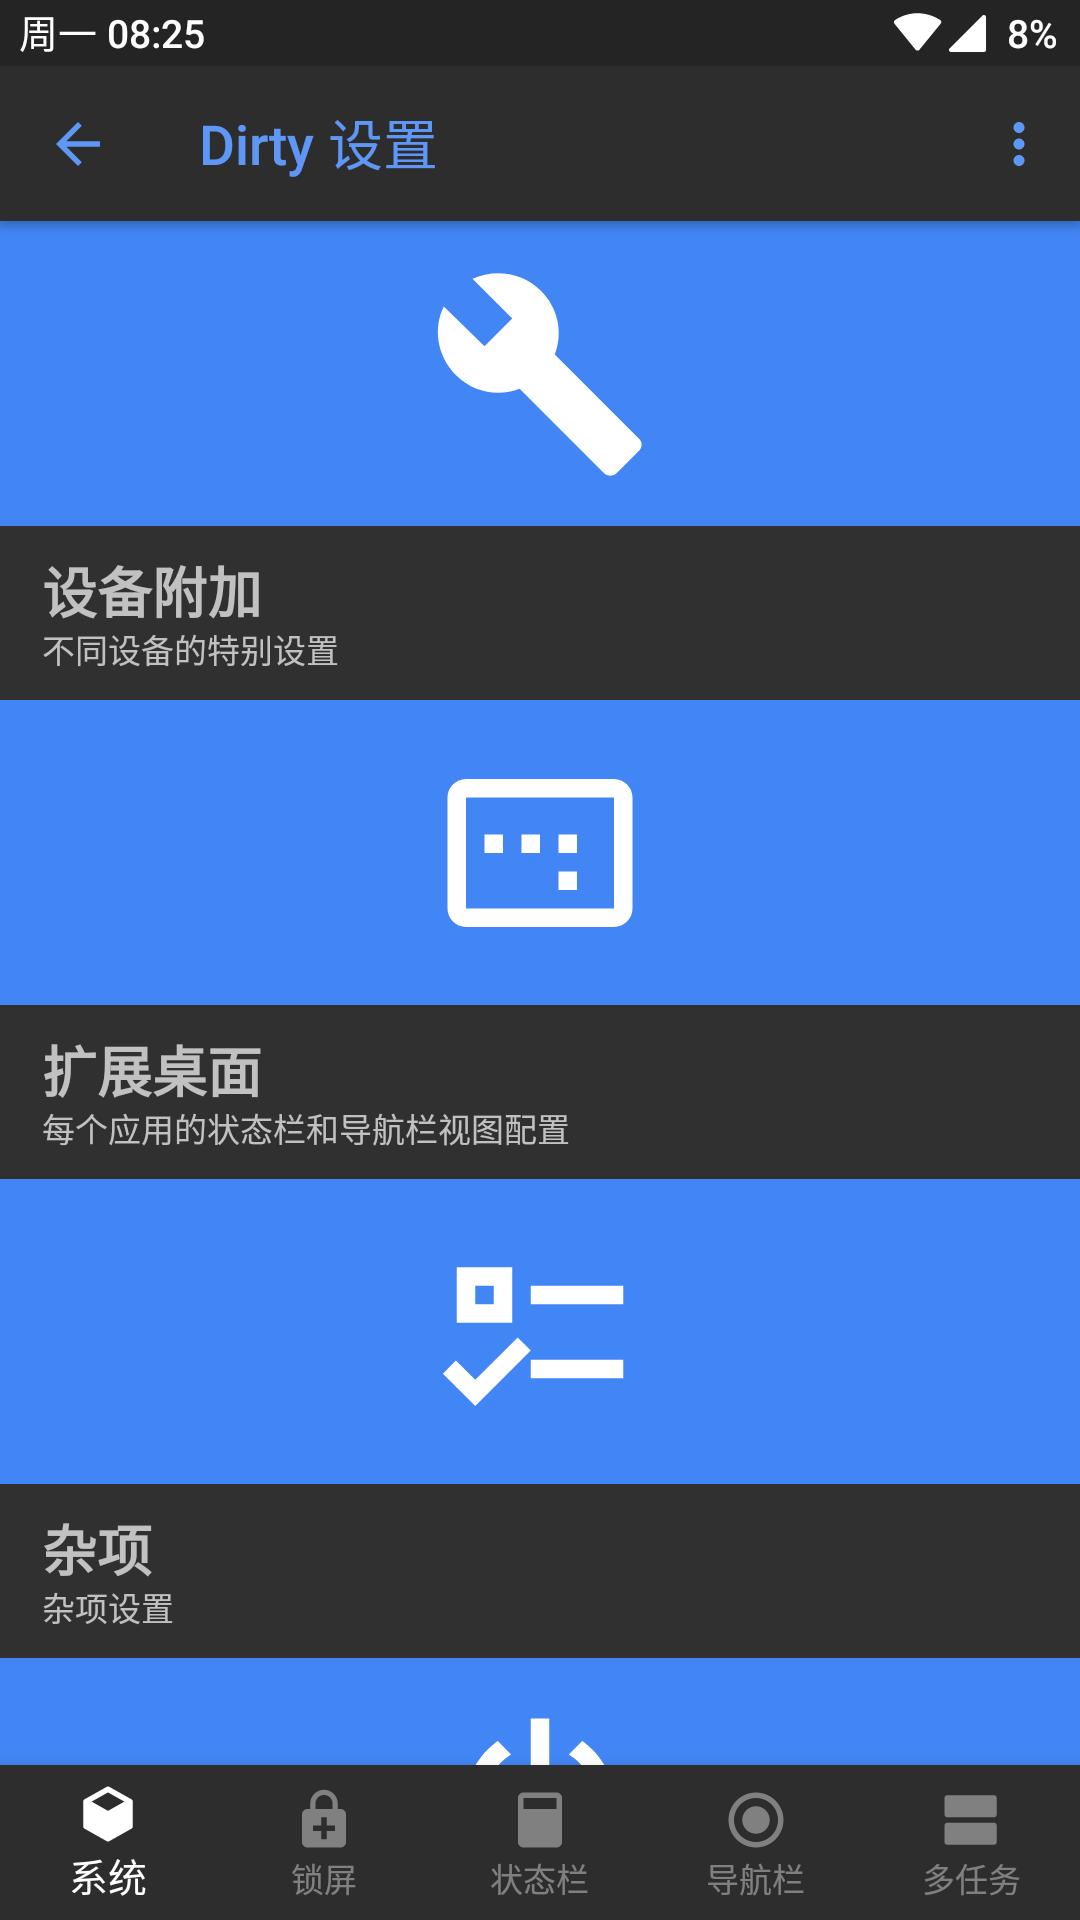 Screenshot_20190128-082514.png